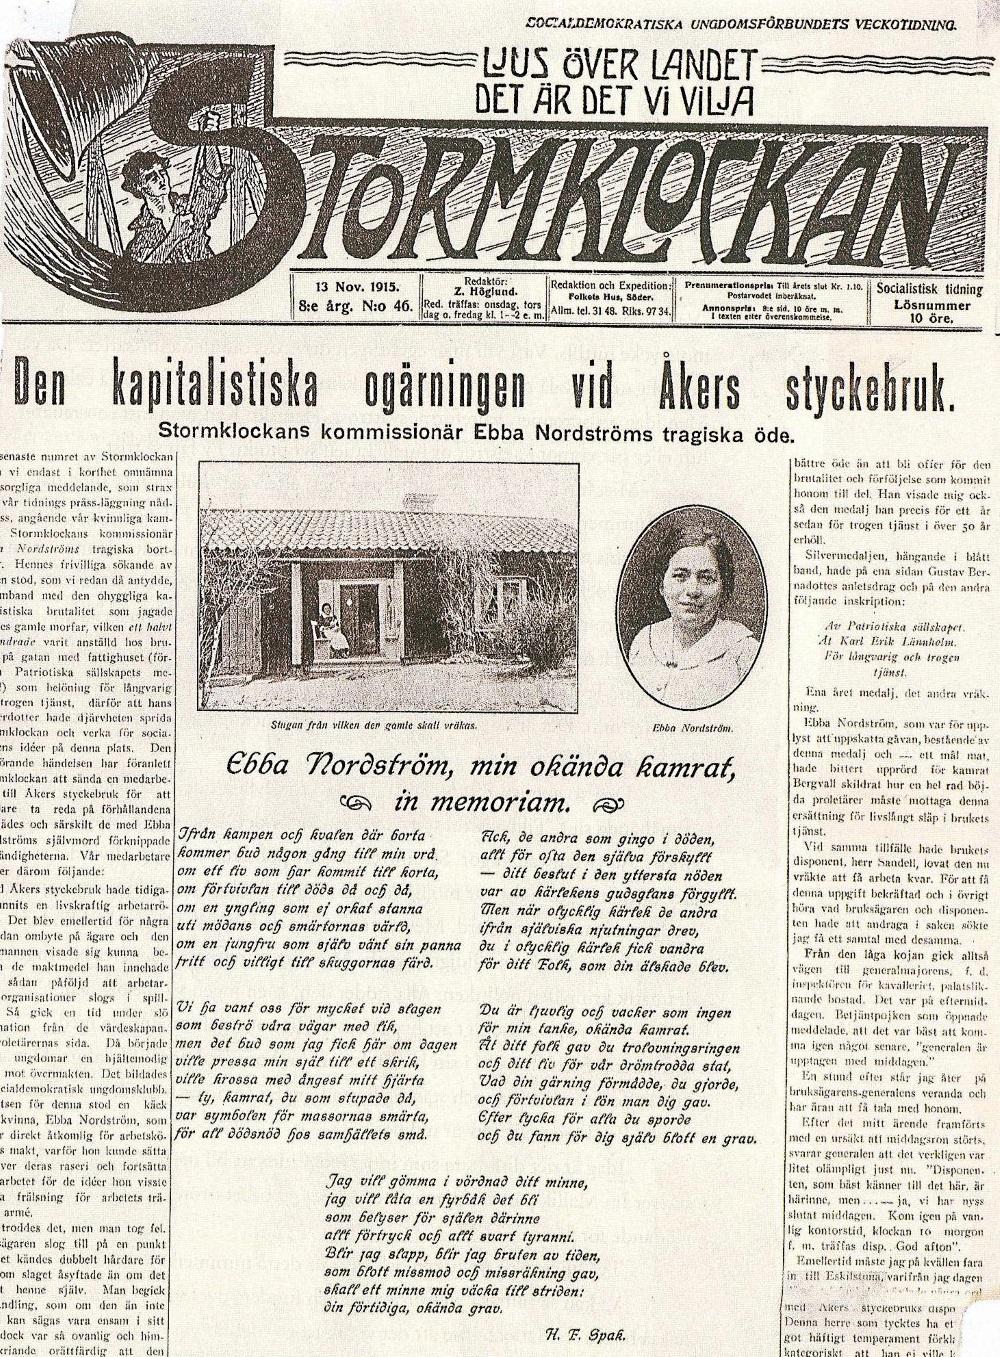 Stormklockan, 13 november 1915